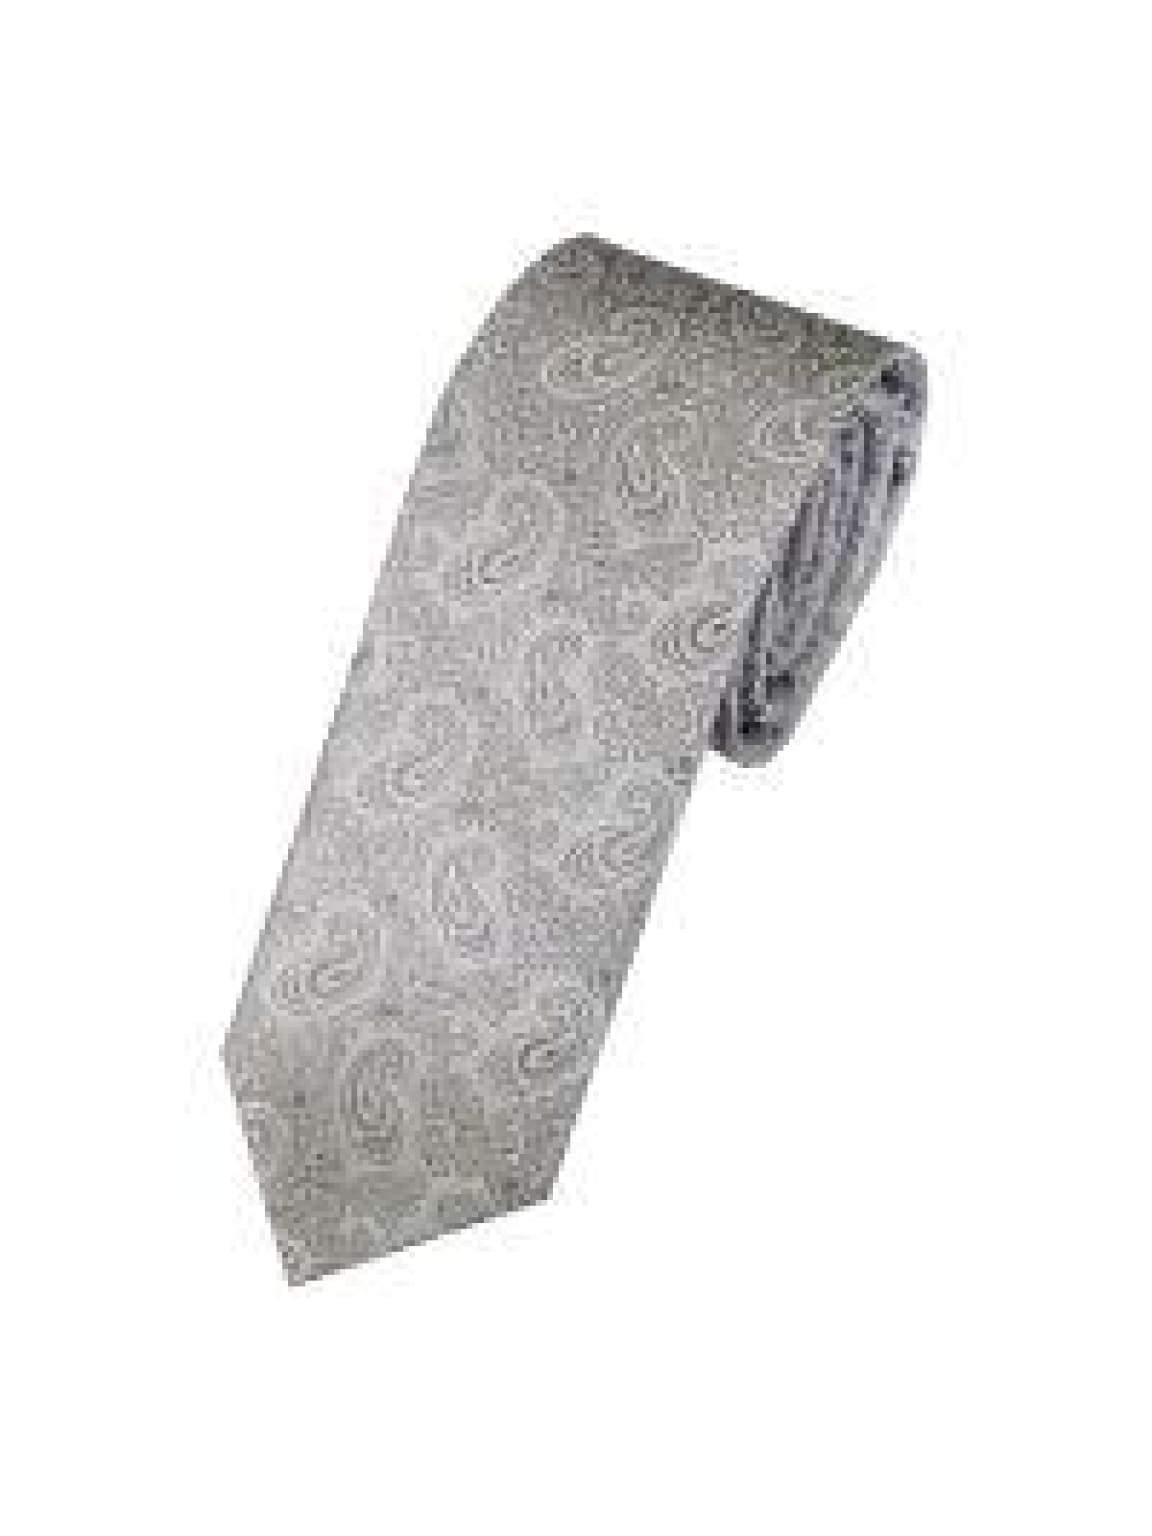 LA Smith Silver Skinny Paisley Tie - Accessories